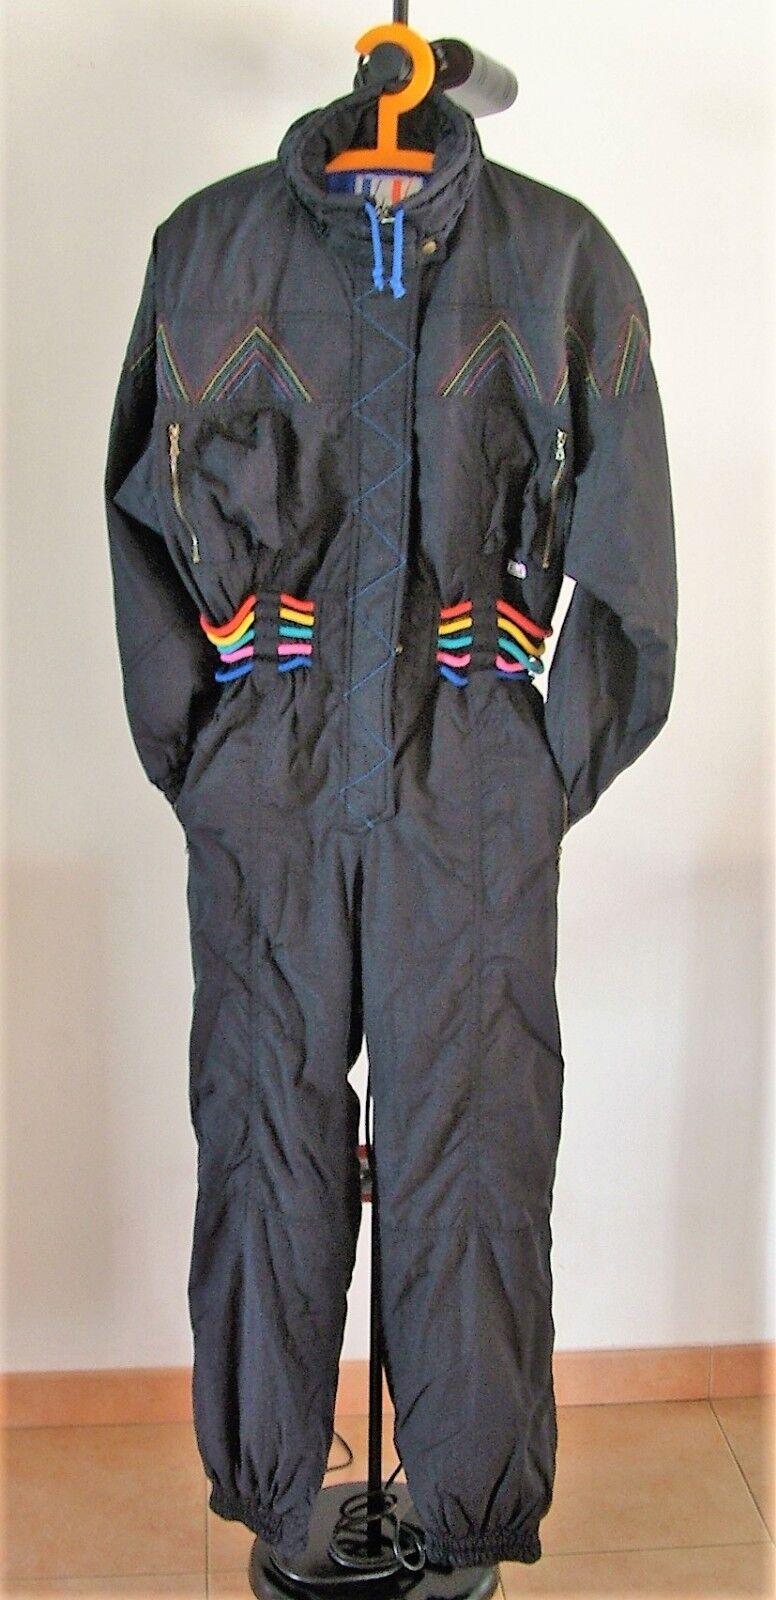 TRAJE esquí Vtg V DE V anni 80 Ski Suit Unisex Talla L